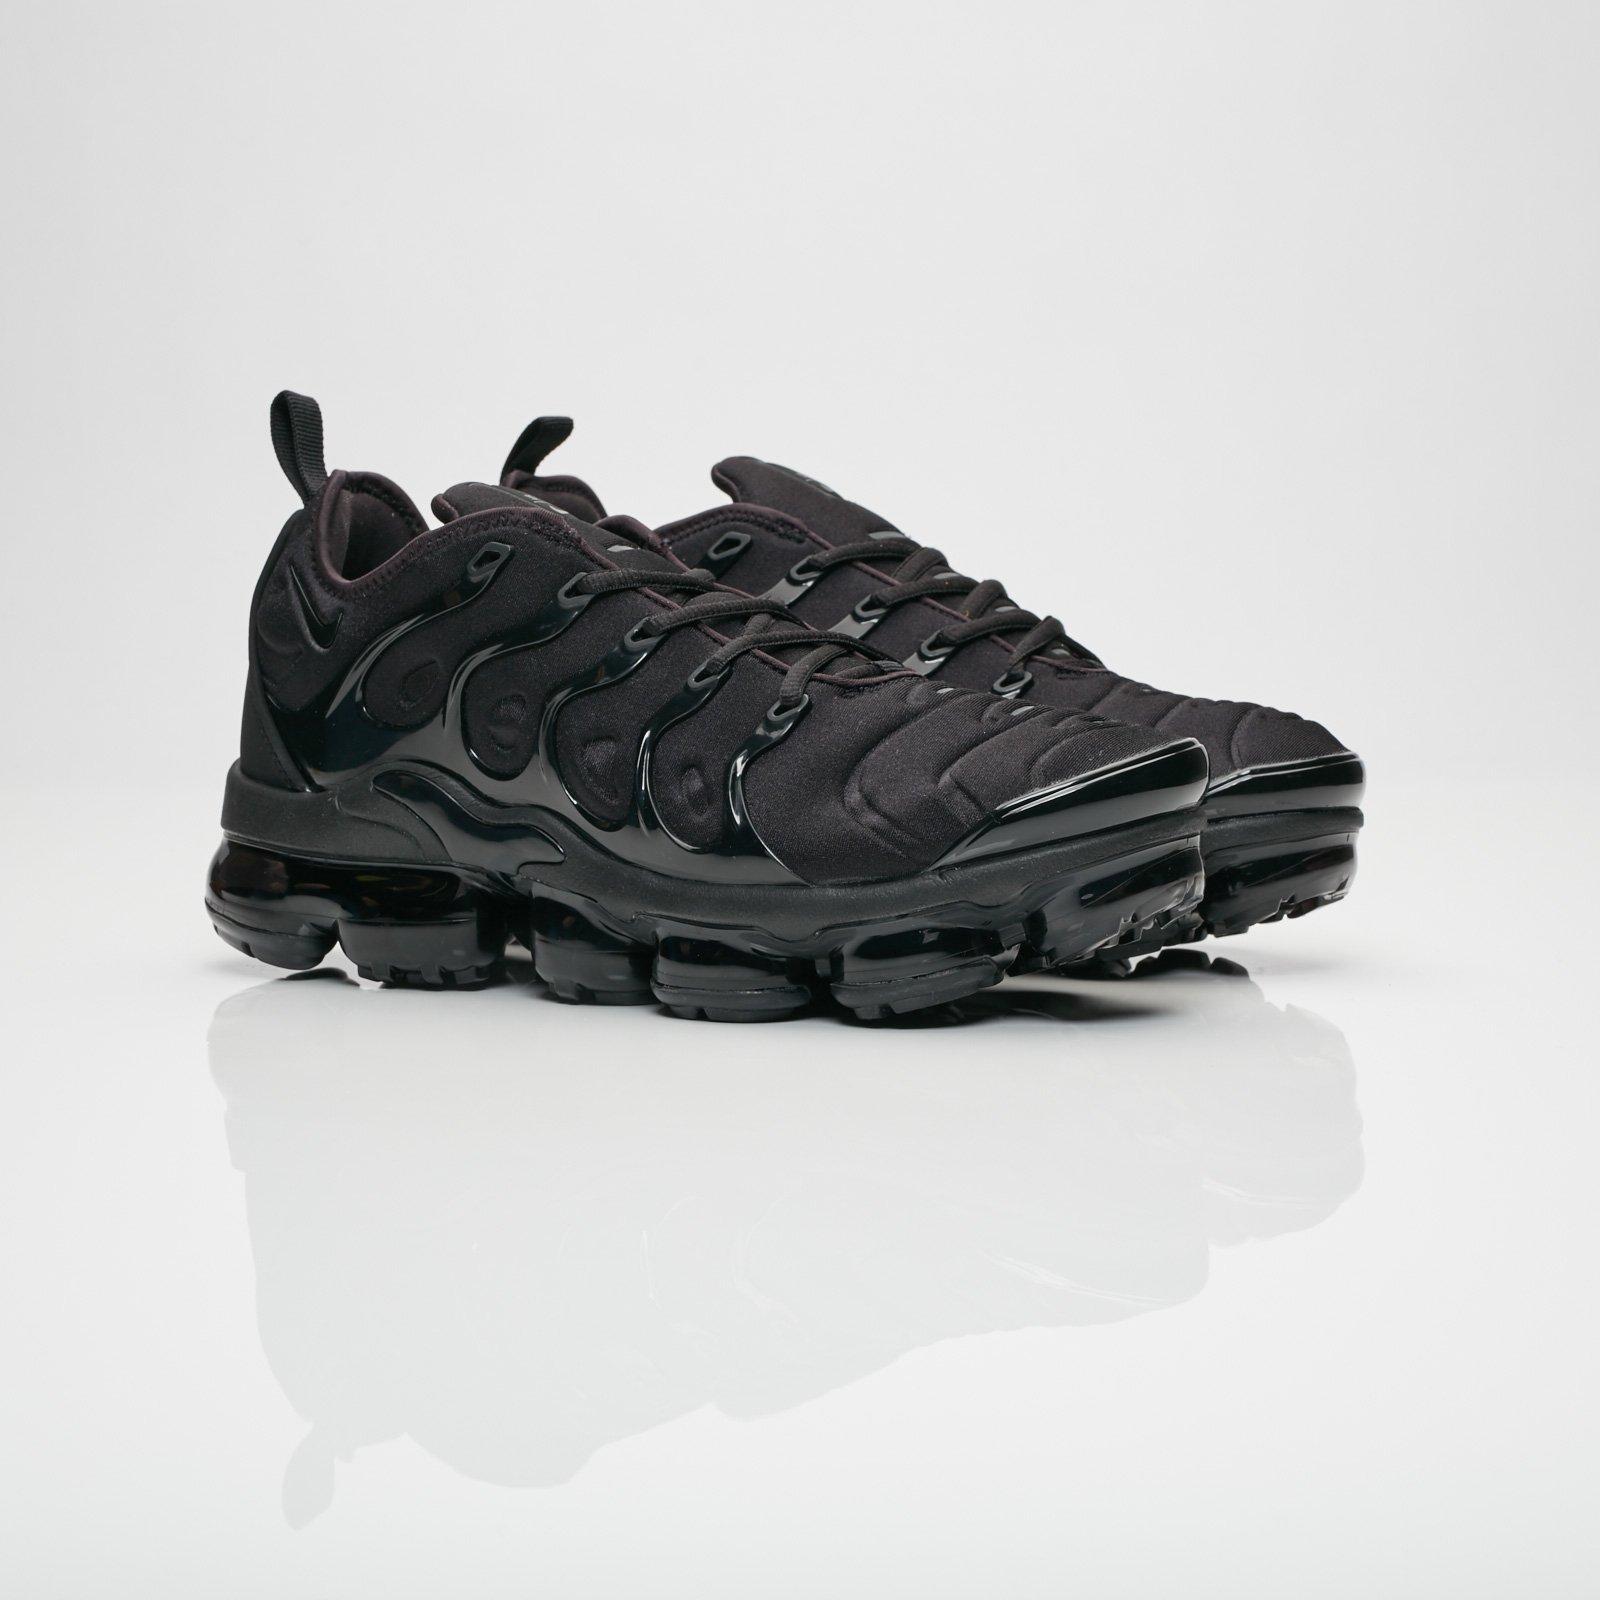 b639d6840f2ba Nike Air Vapormax Plus - 924453-004 - Sneakersnstuff   sneakers ...